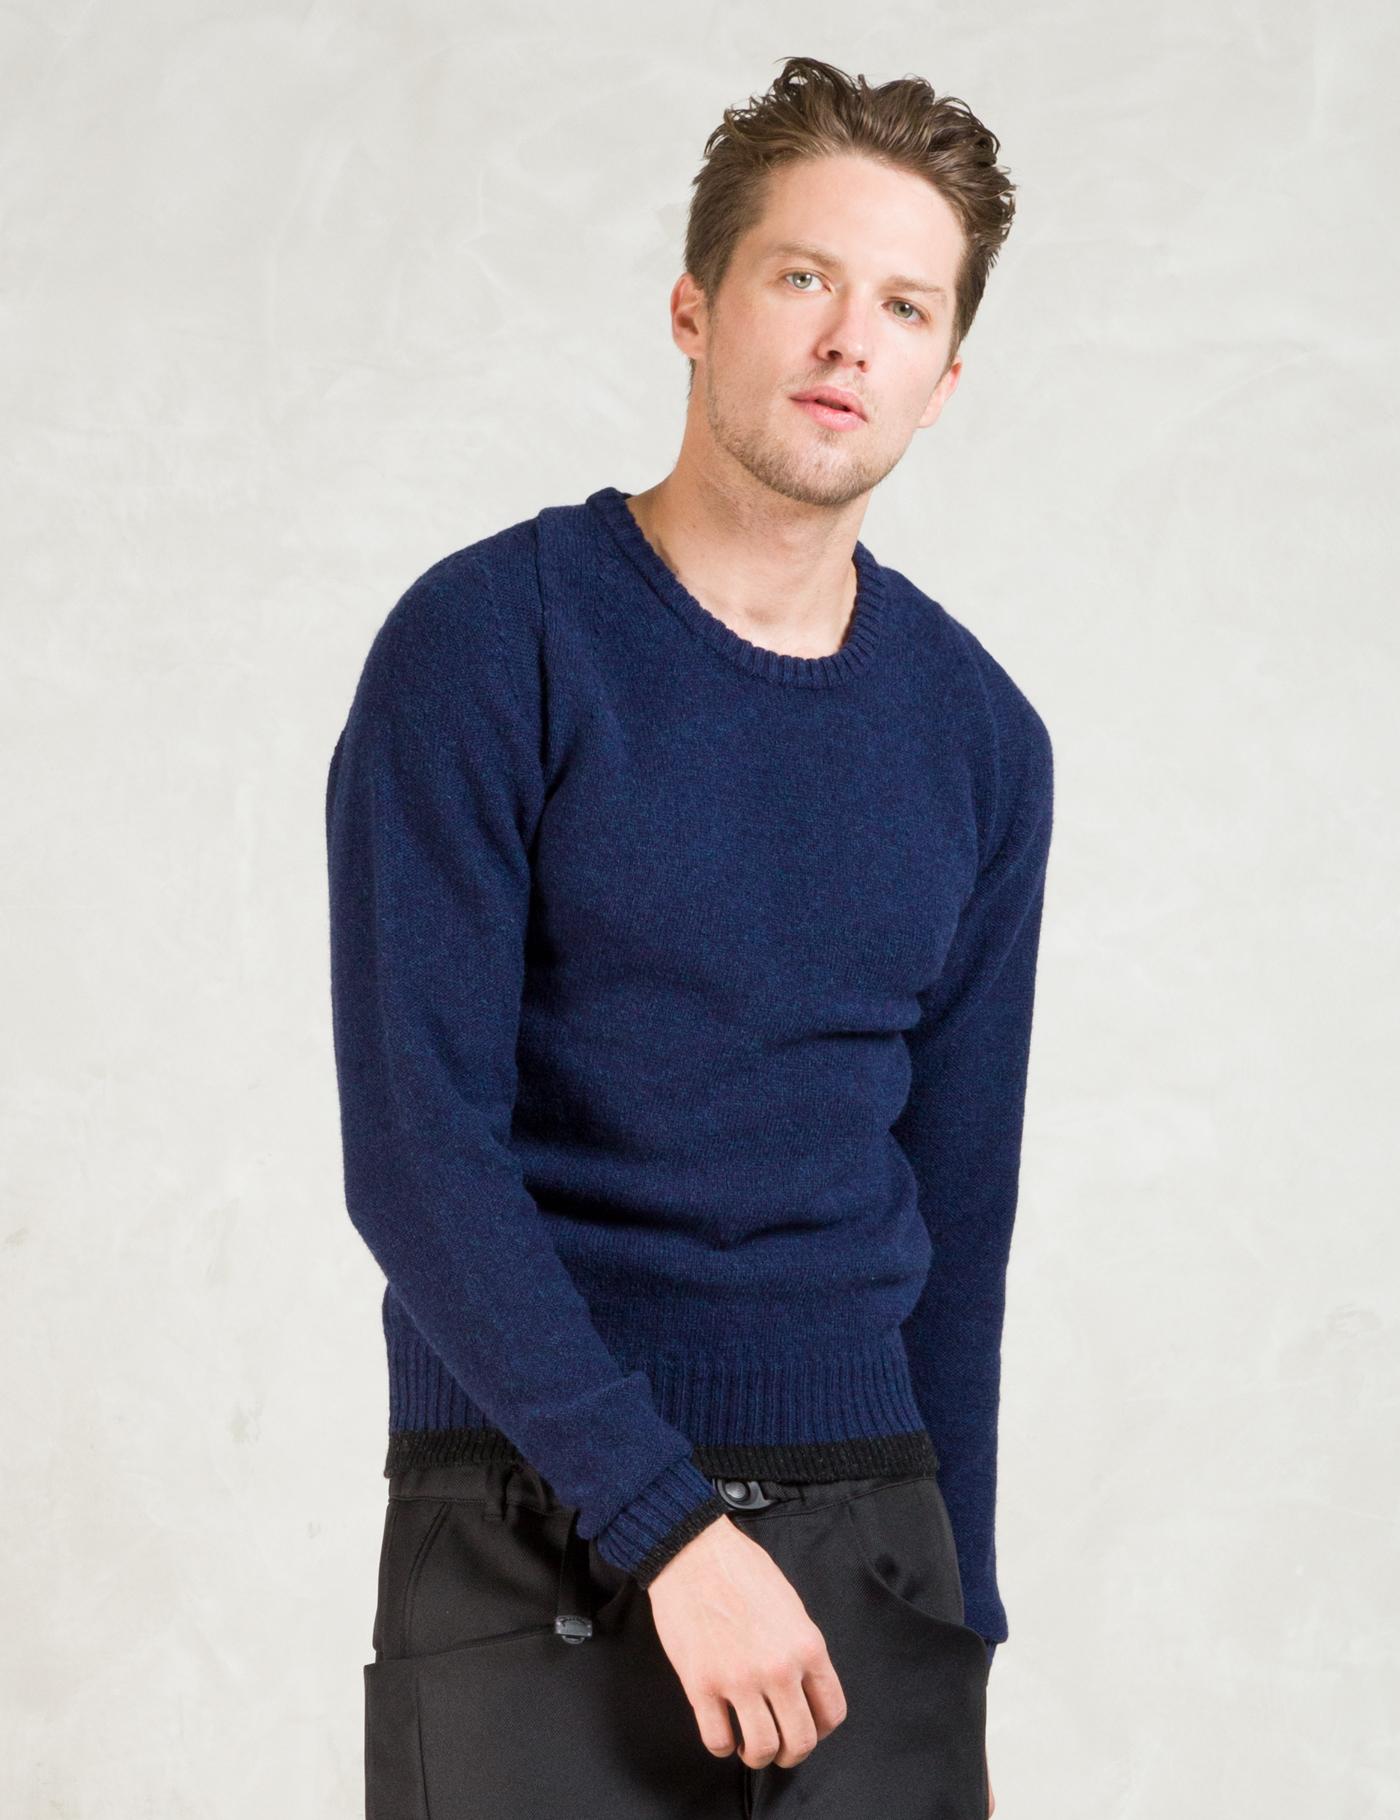 Dc Hbx Man Of Moods Blue Shetland Wool Crewneck Sweater Hbx